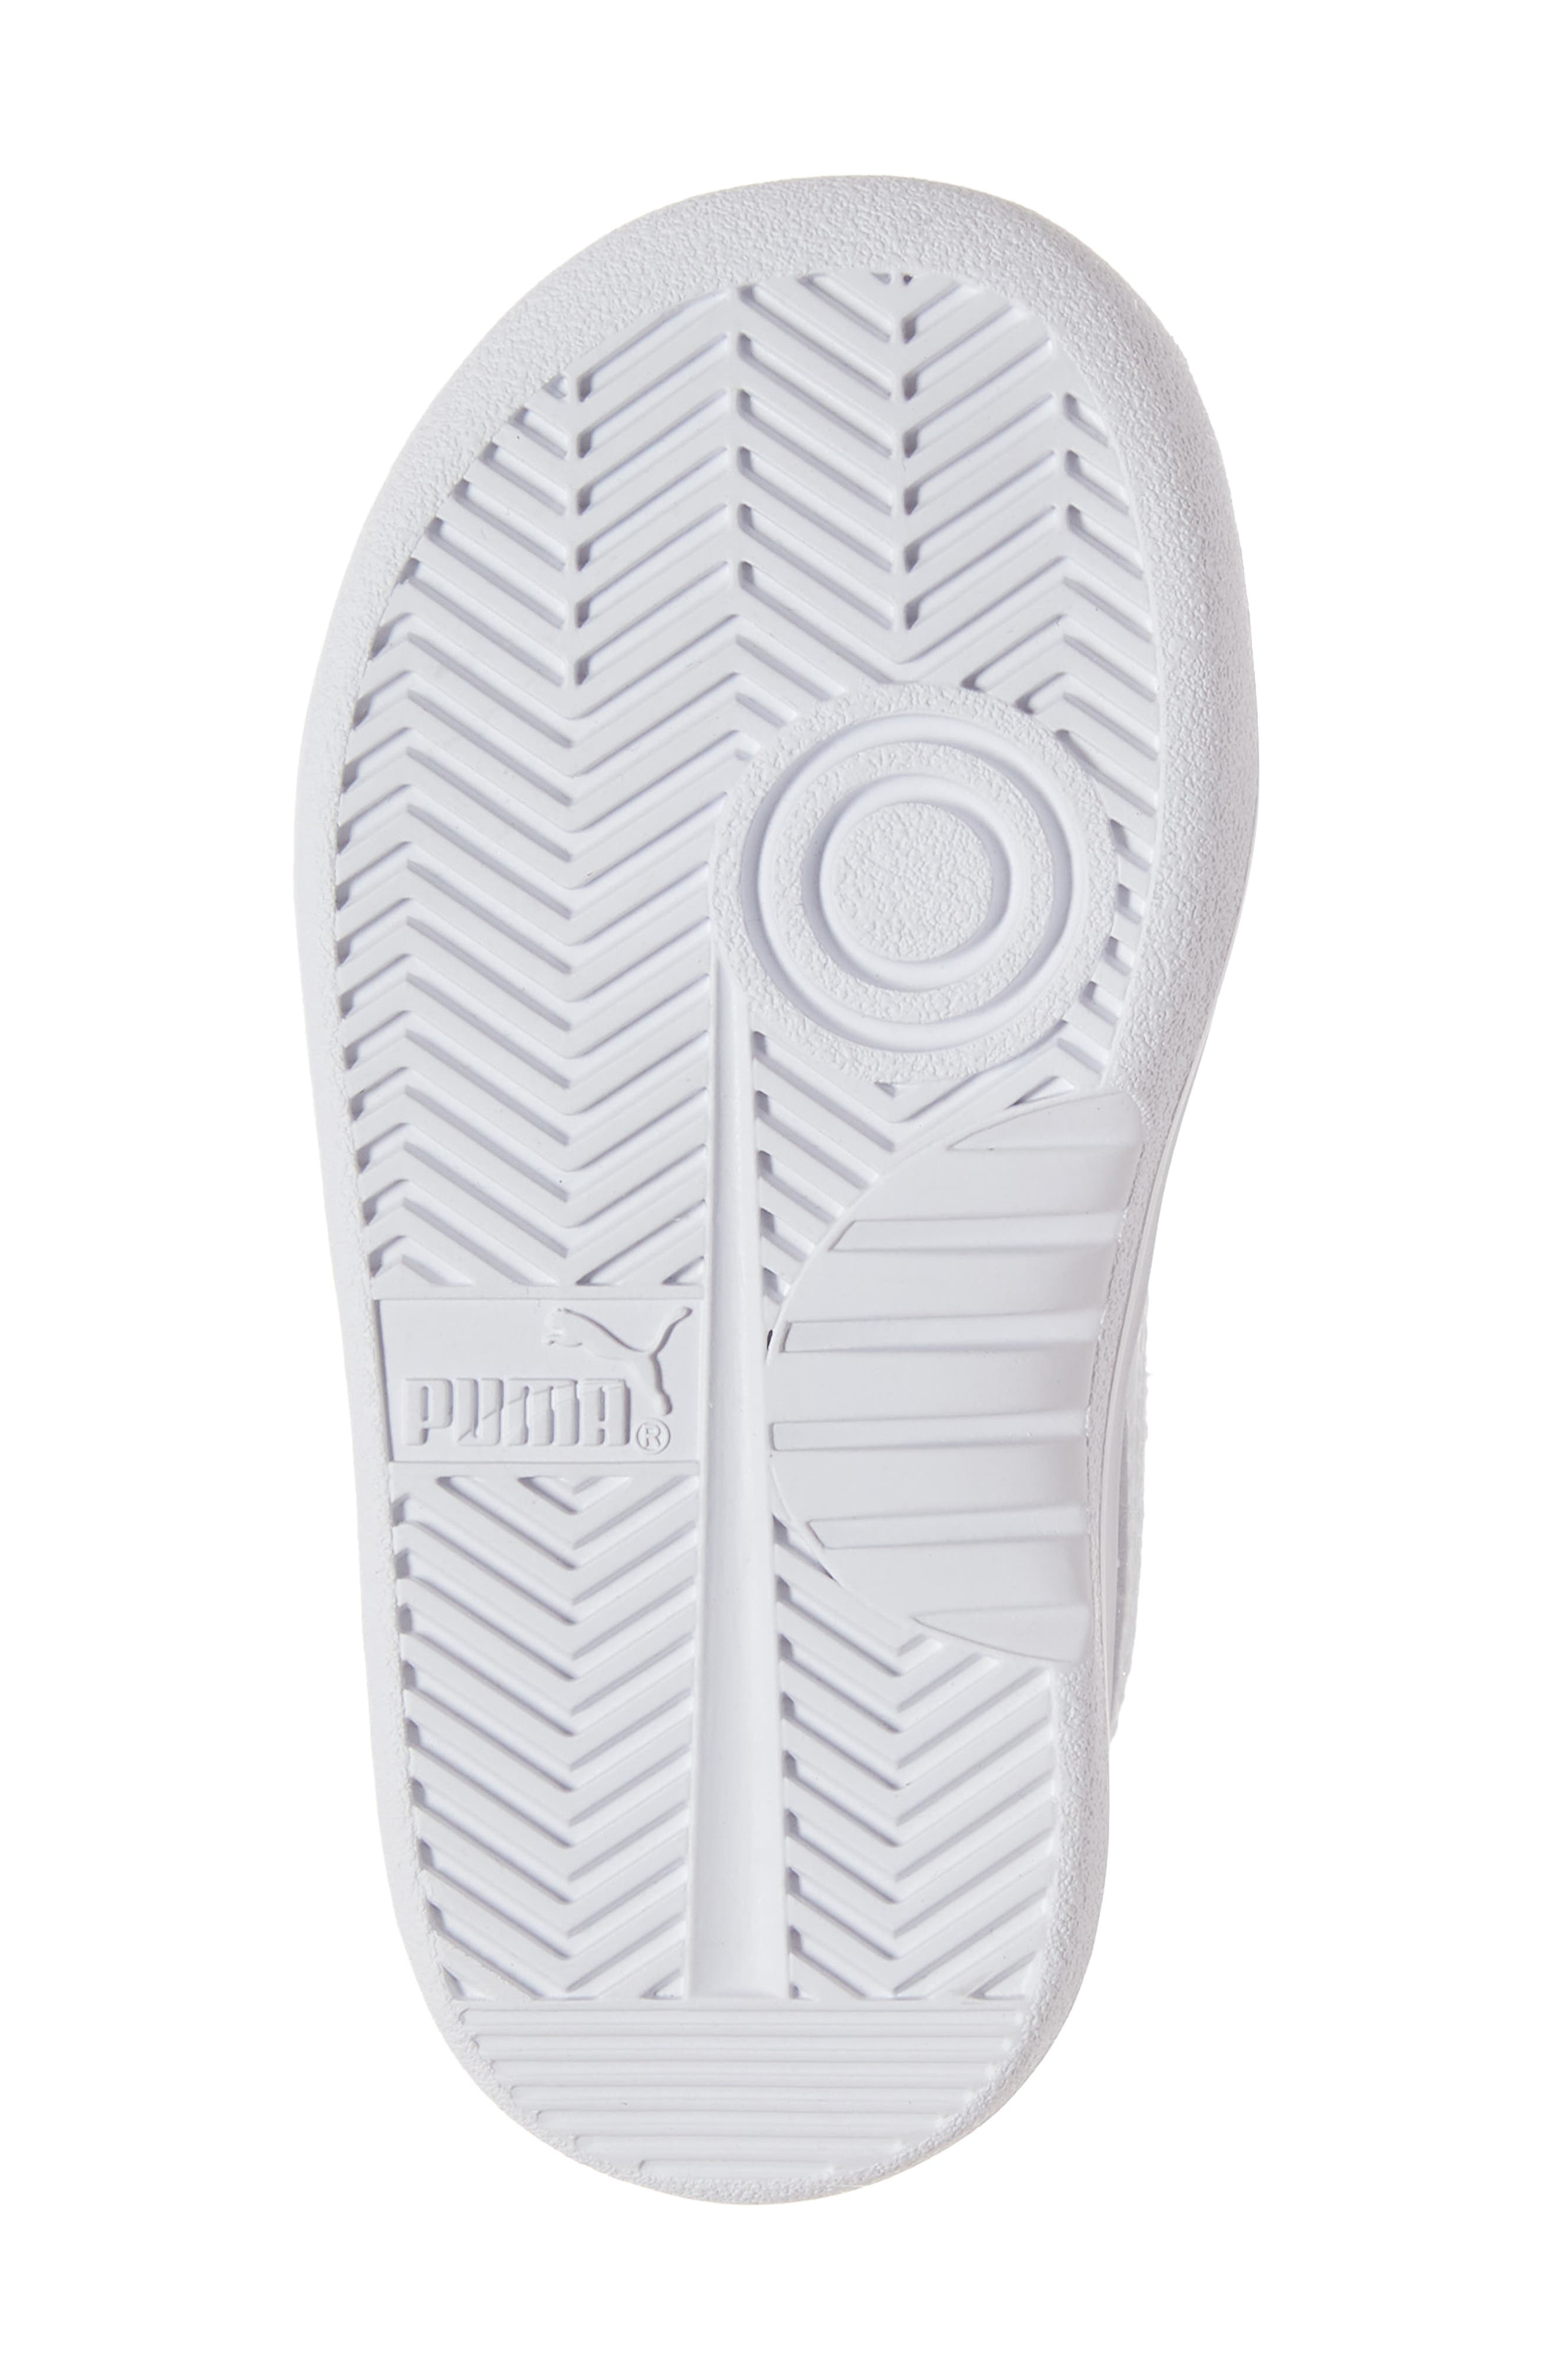 GV Special Sneaker,                             Alternate thumbnail 6, color,                             PUMA WHITE-PUMA TEAM GOLD